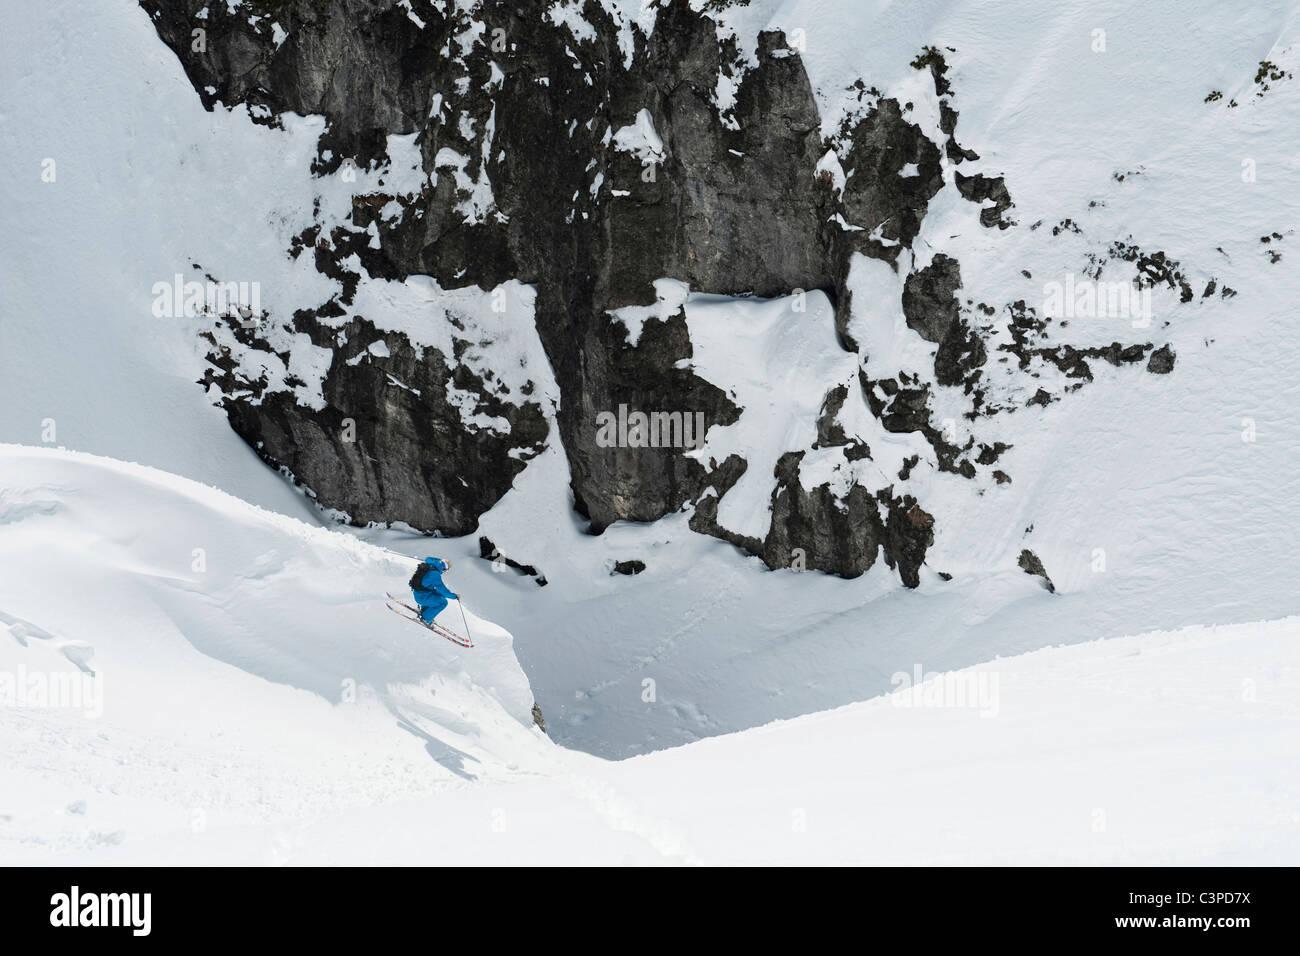 Austria, Arlberg, Man skiing downhill, doing jump - Stock Image